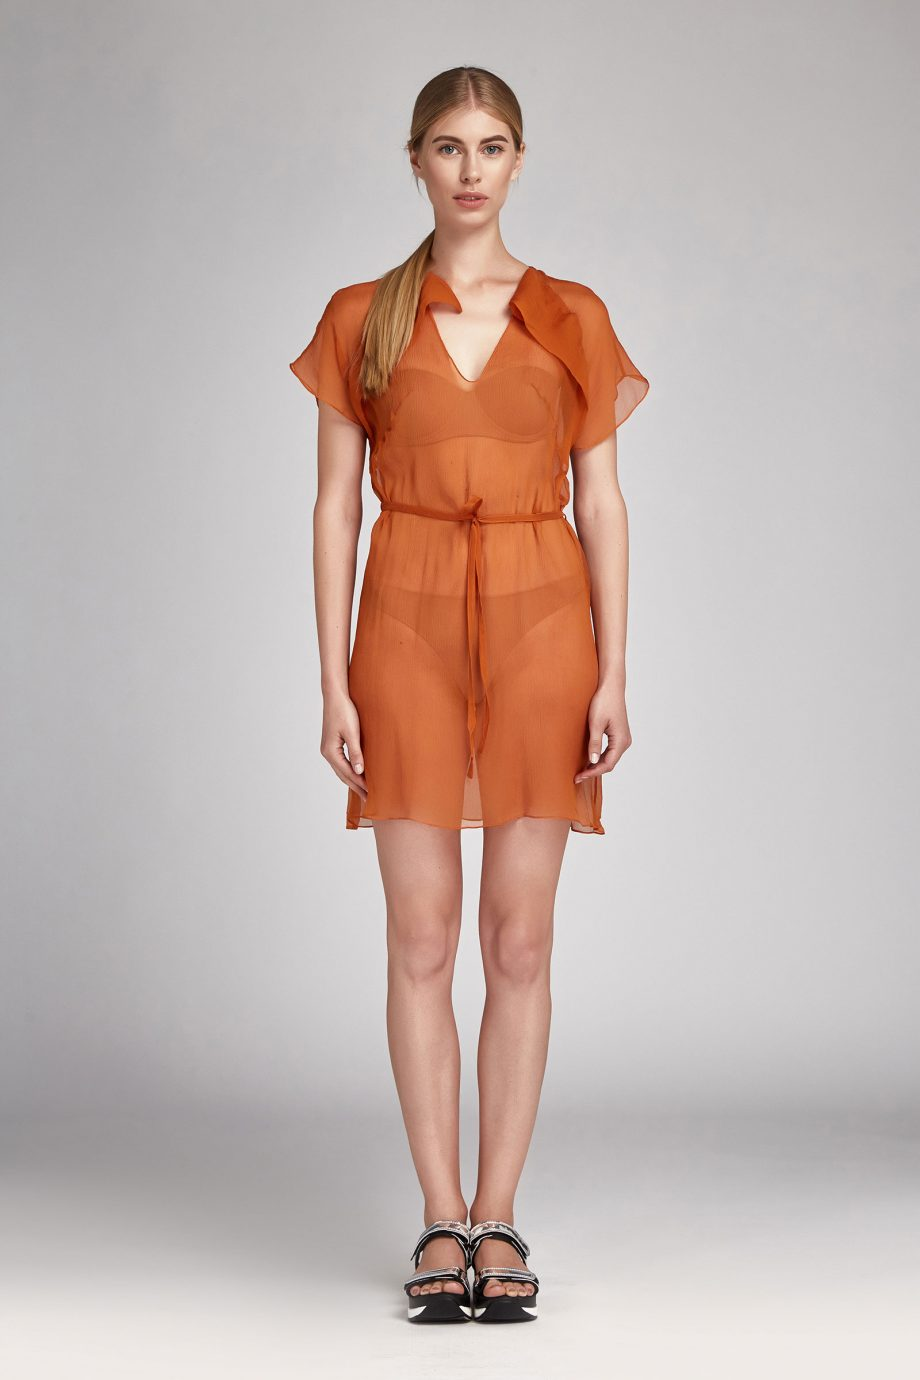 orange-bud-01